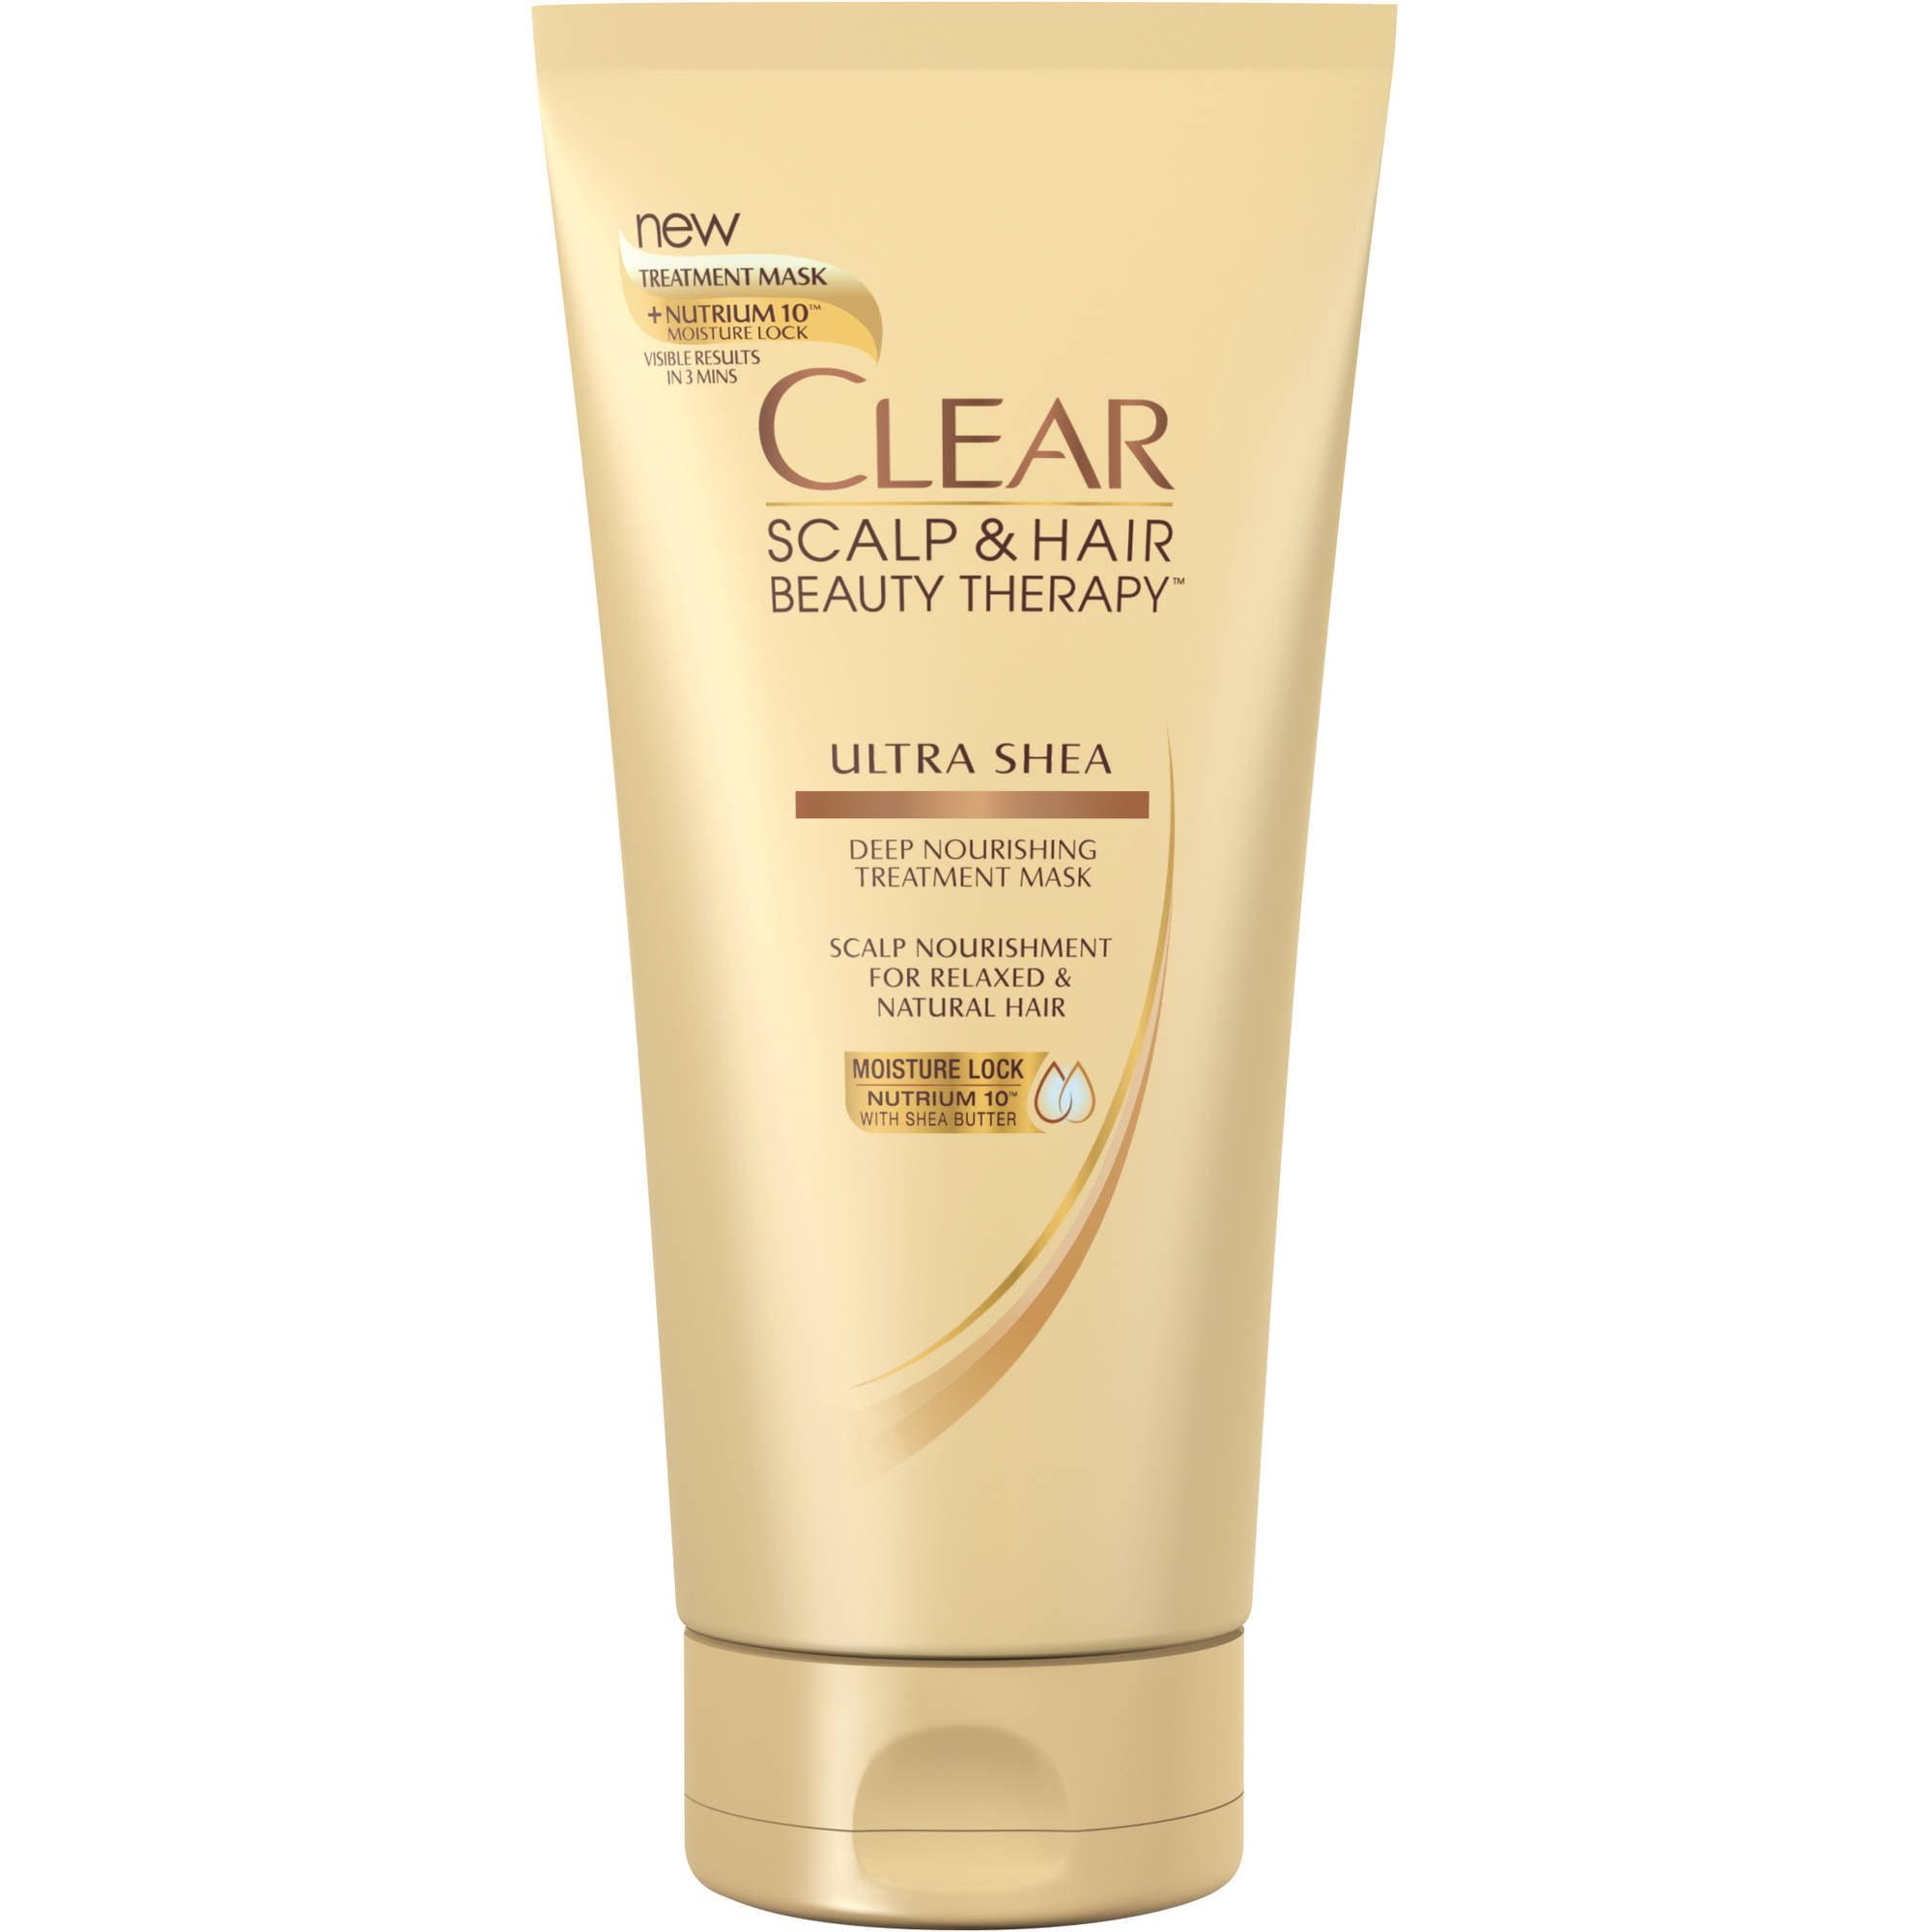 Clear Clr Cd Ultra Shea Dp Cond Mask 12 6z